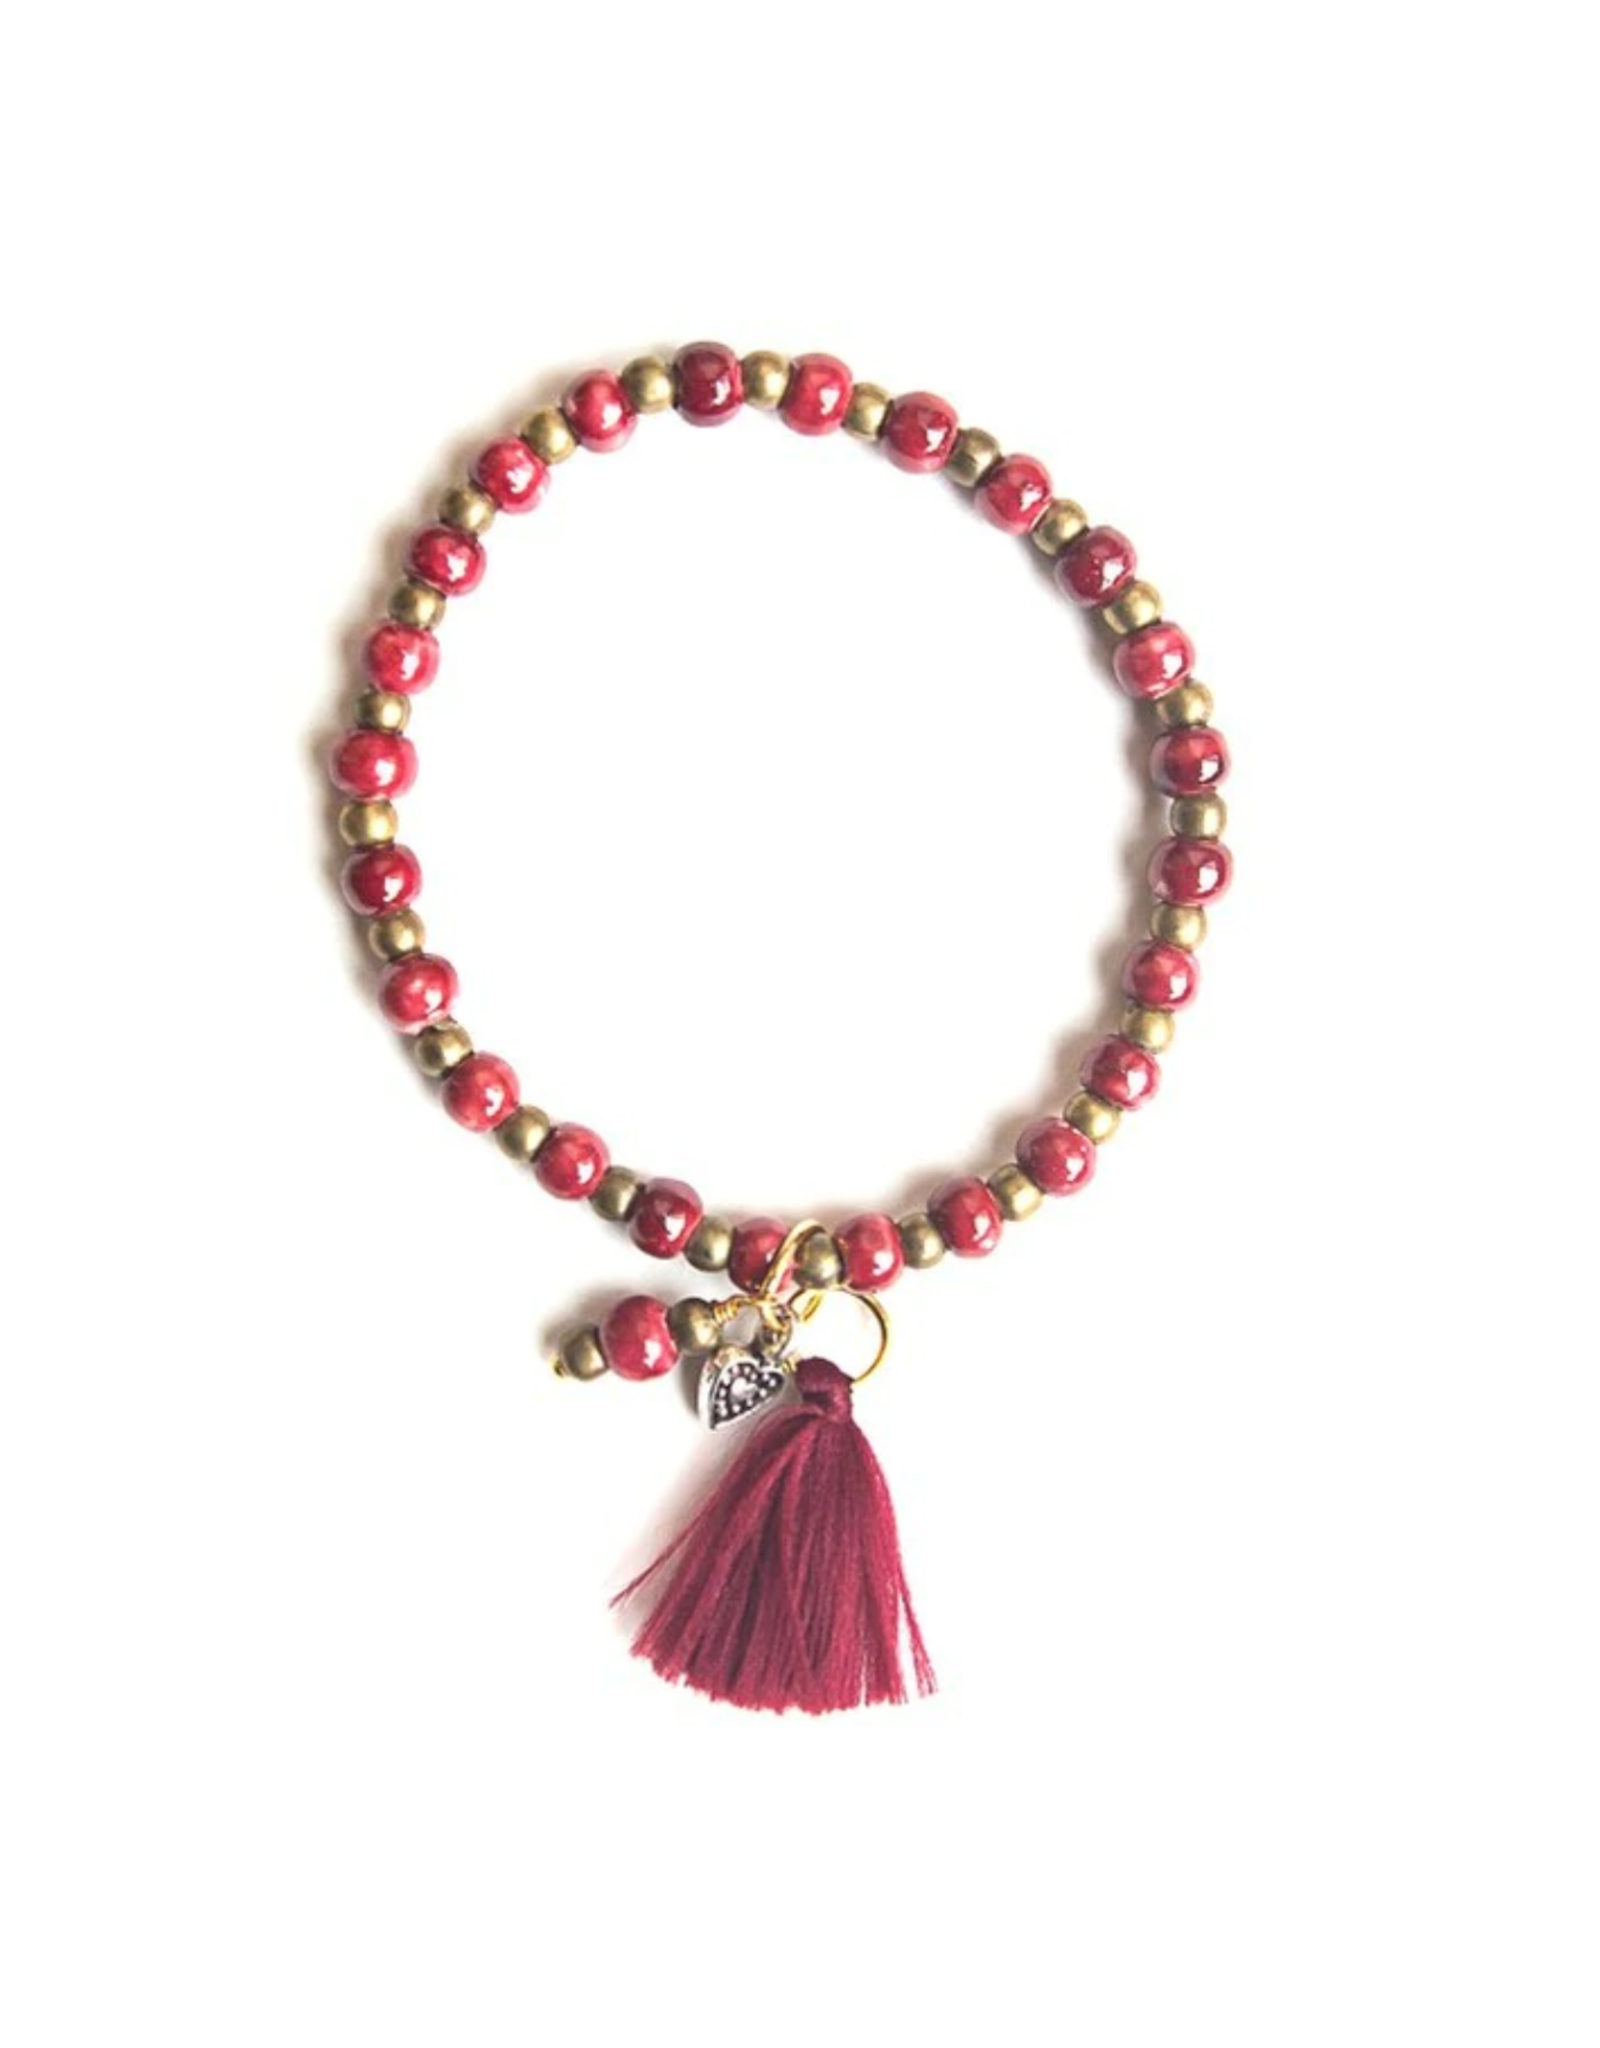 Amor Ceramic Tassle Bracelet